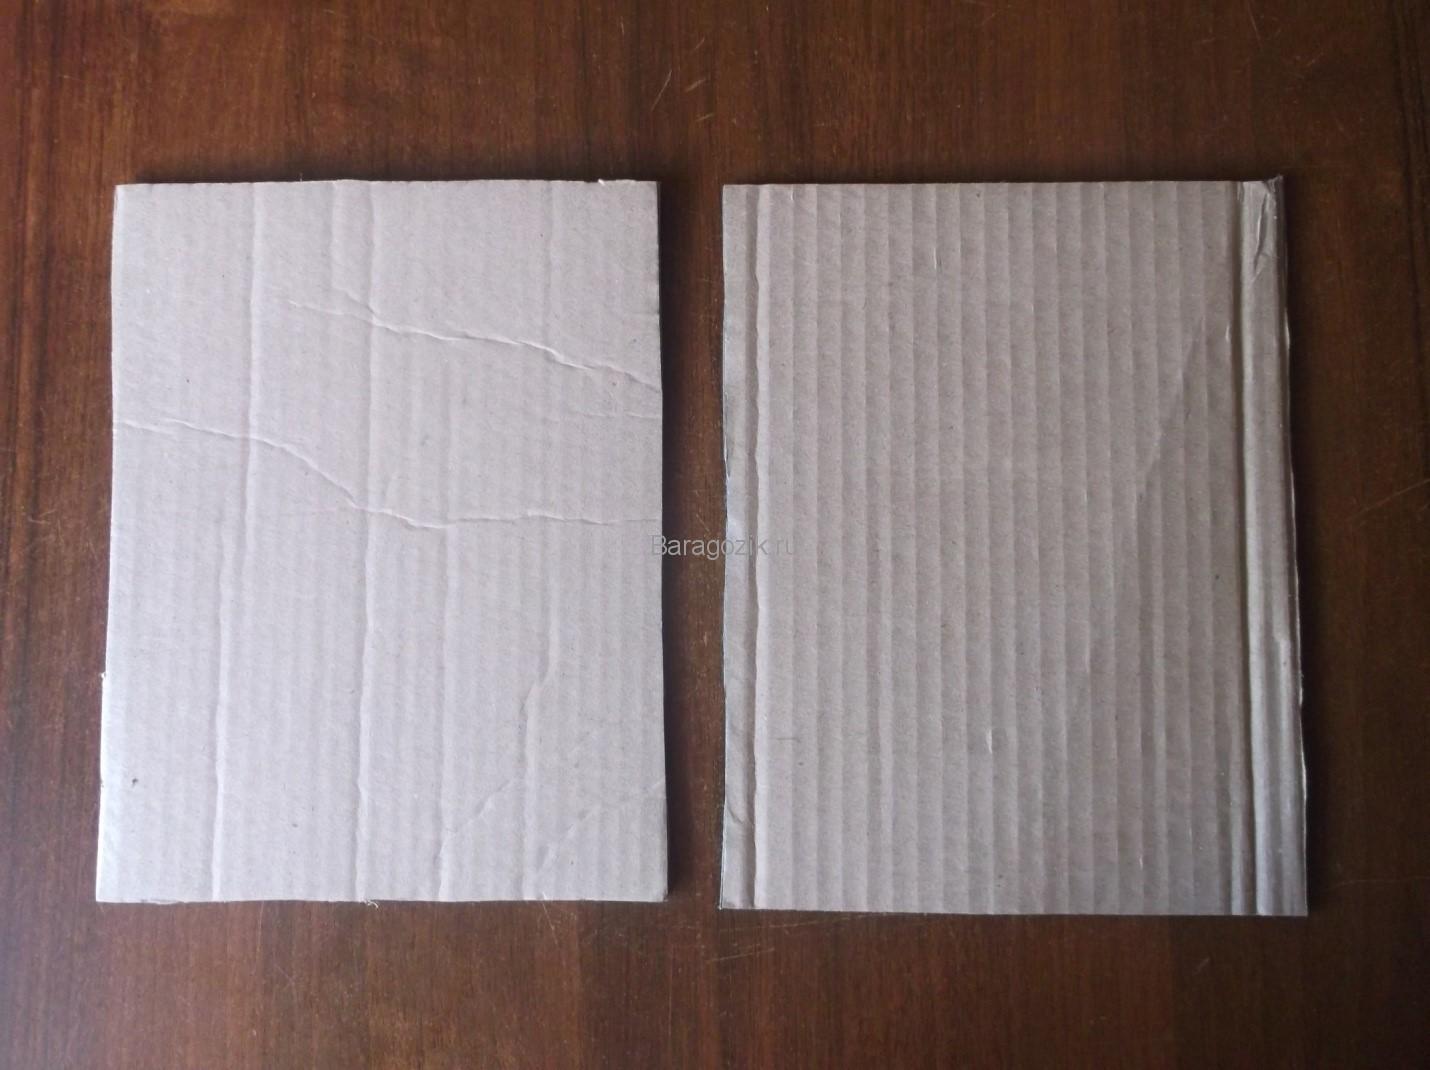 papka-dlya-tetradej-svoimi-rukami-v-podarok-shkolniku2 Как сделать папку для тетрадей своими руками в подарок школьнику